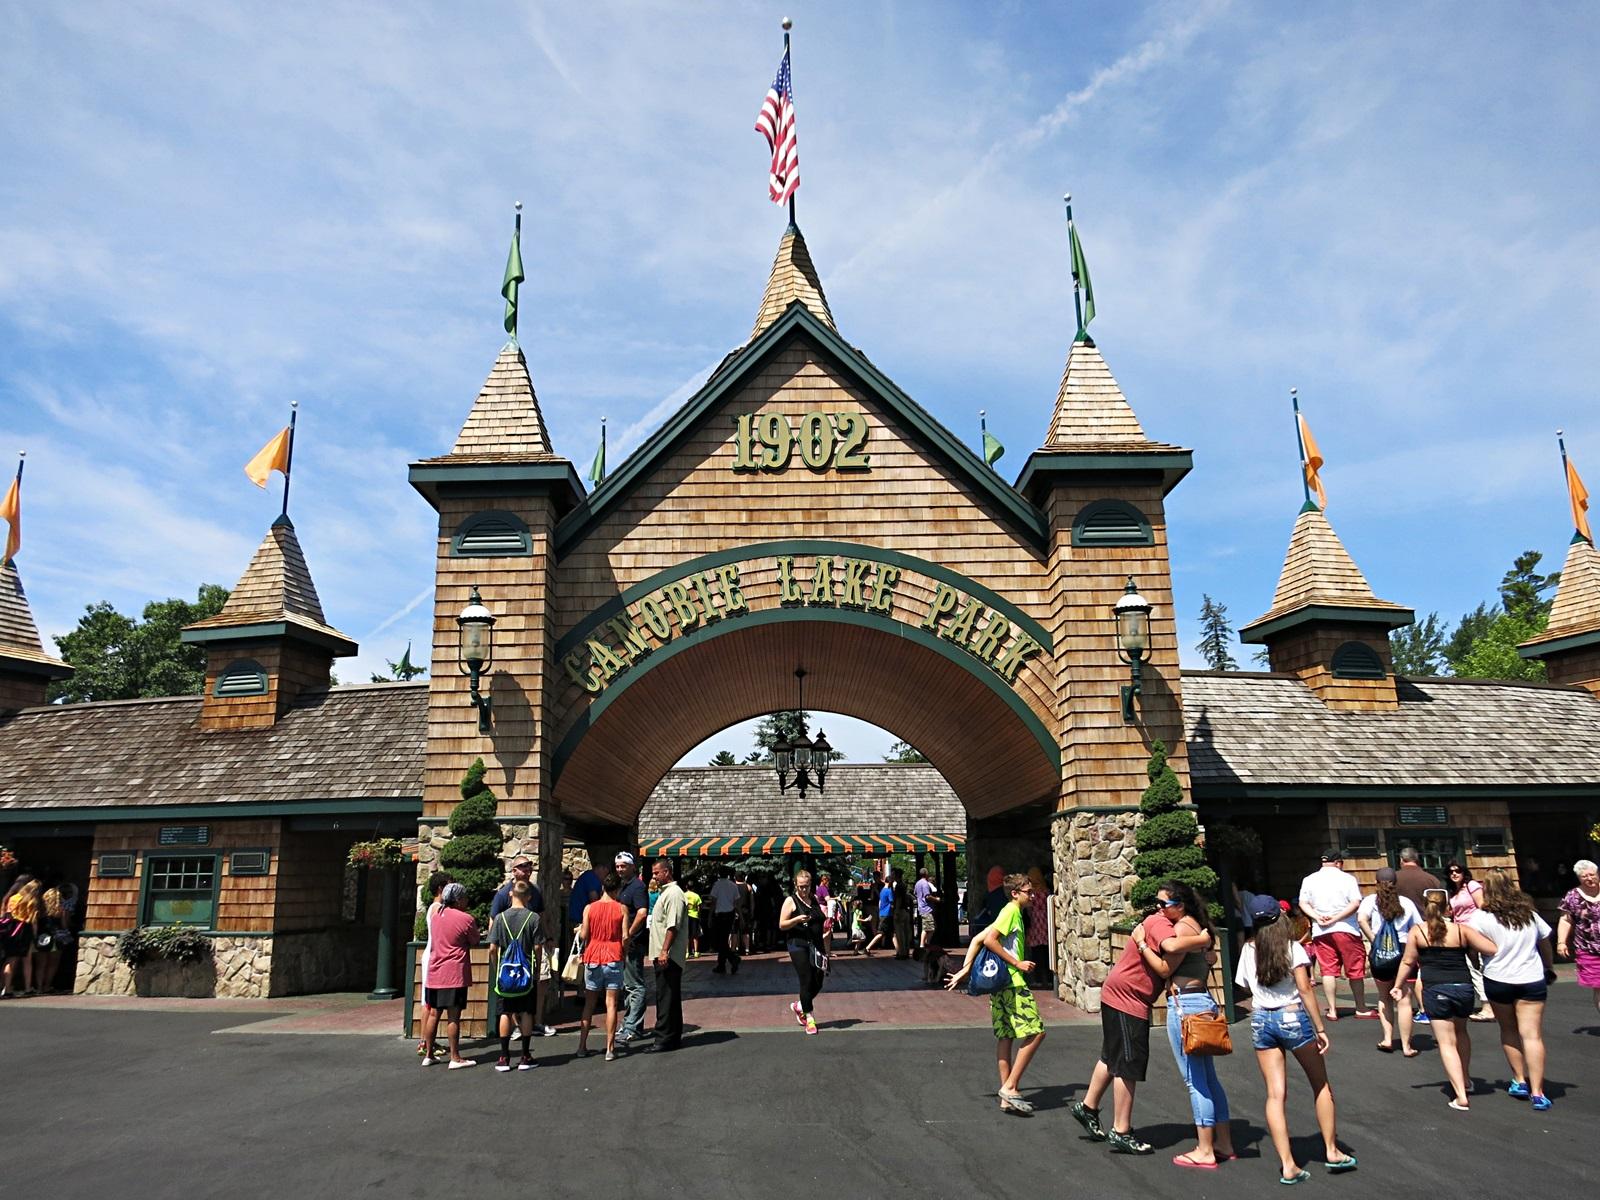 Canobie Lake Park | A Classic New England Amusement Park in Salem, NH